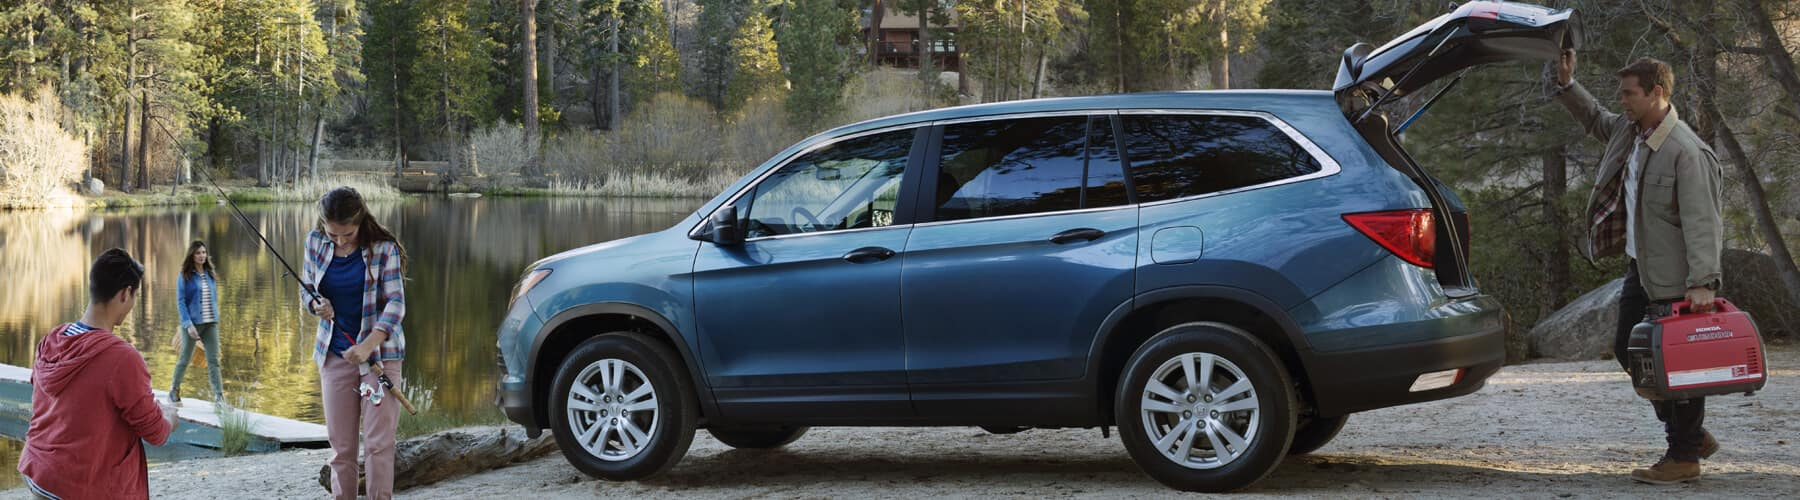 2018 Honda Pilot North Country Honda Dealers Midsize Family Suv